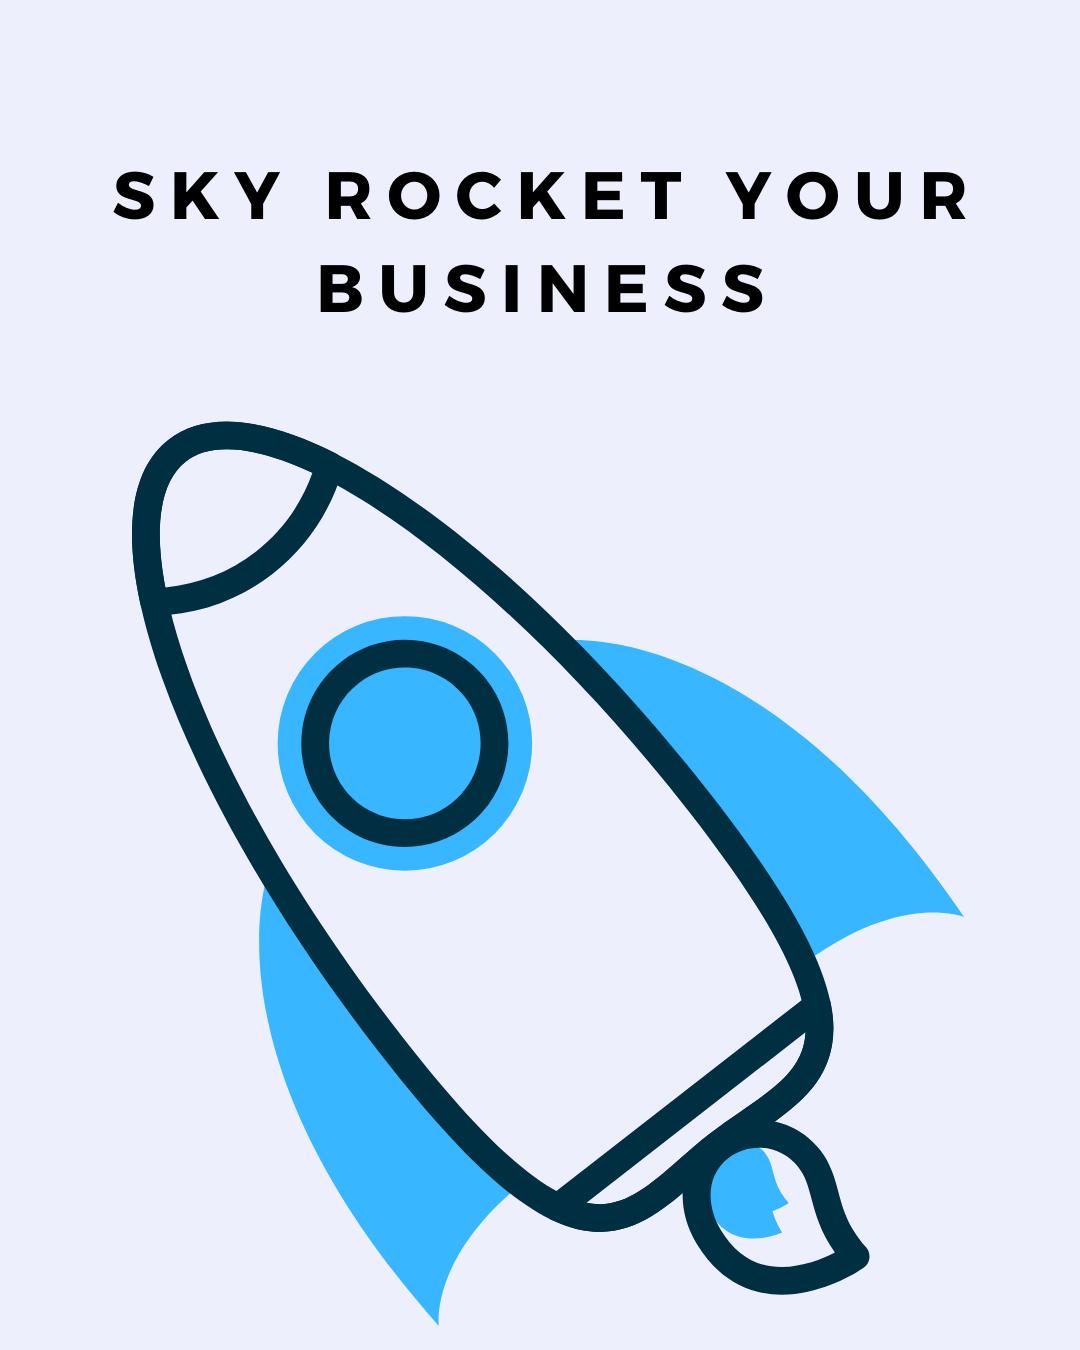 skyrocket-business